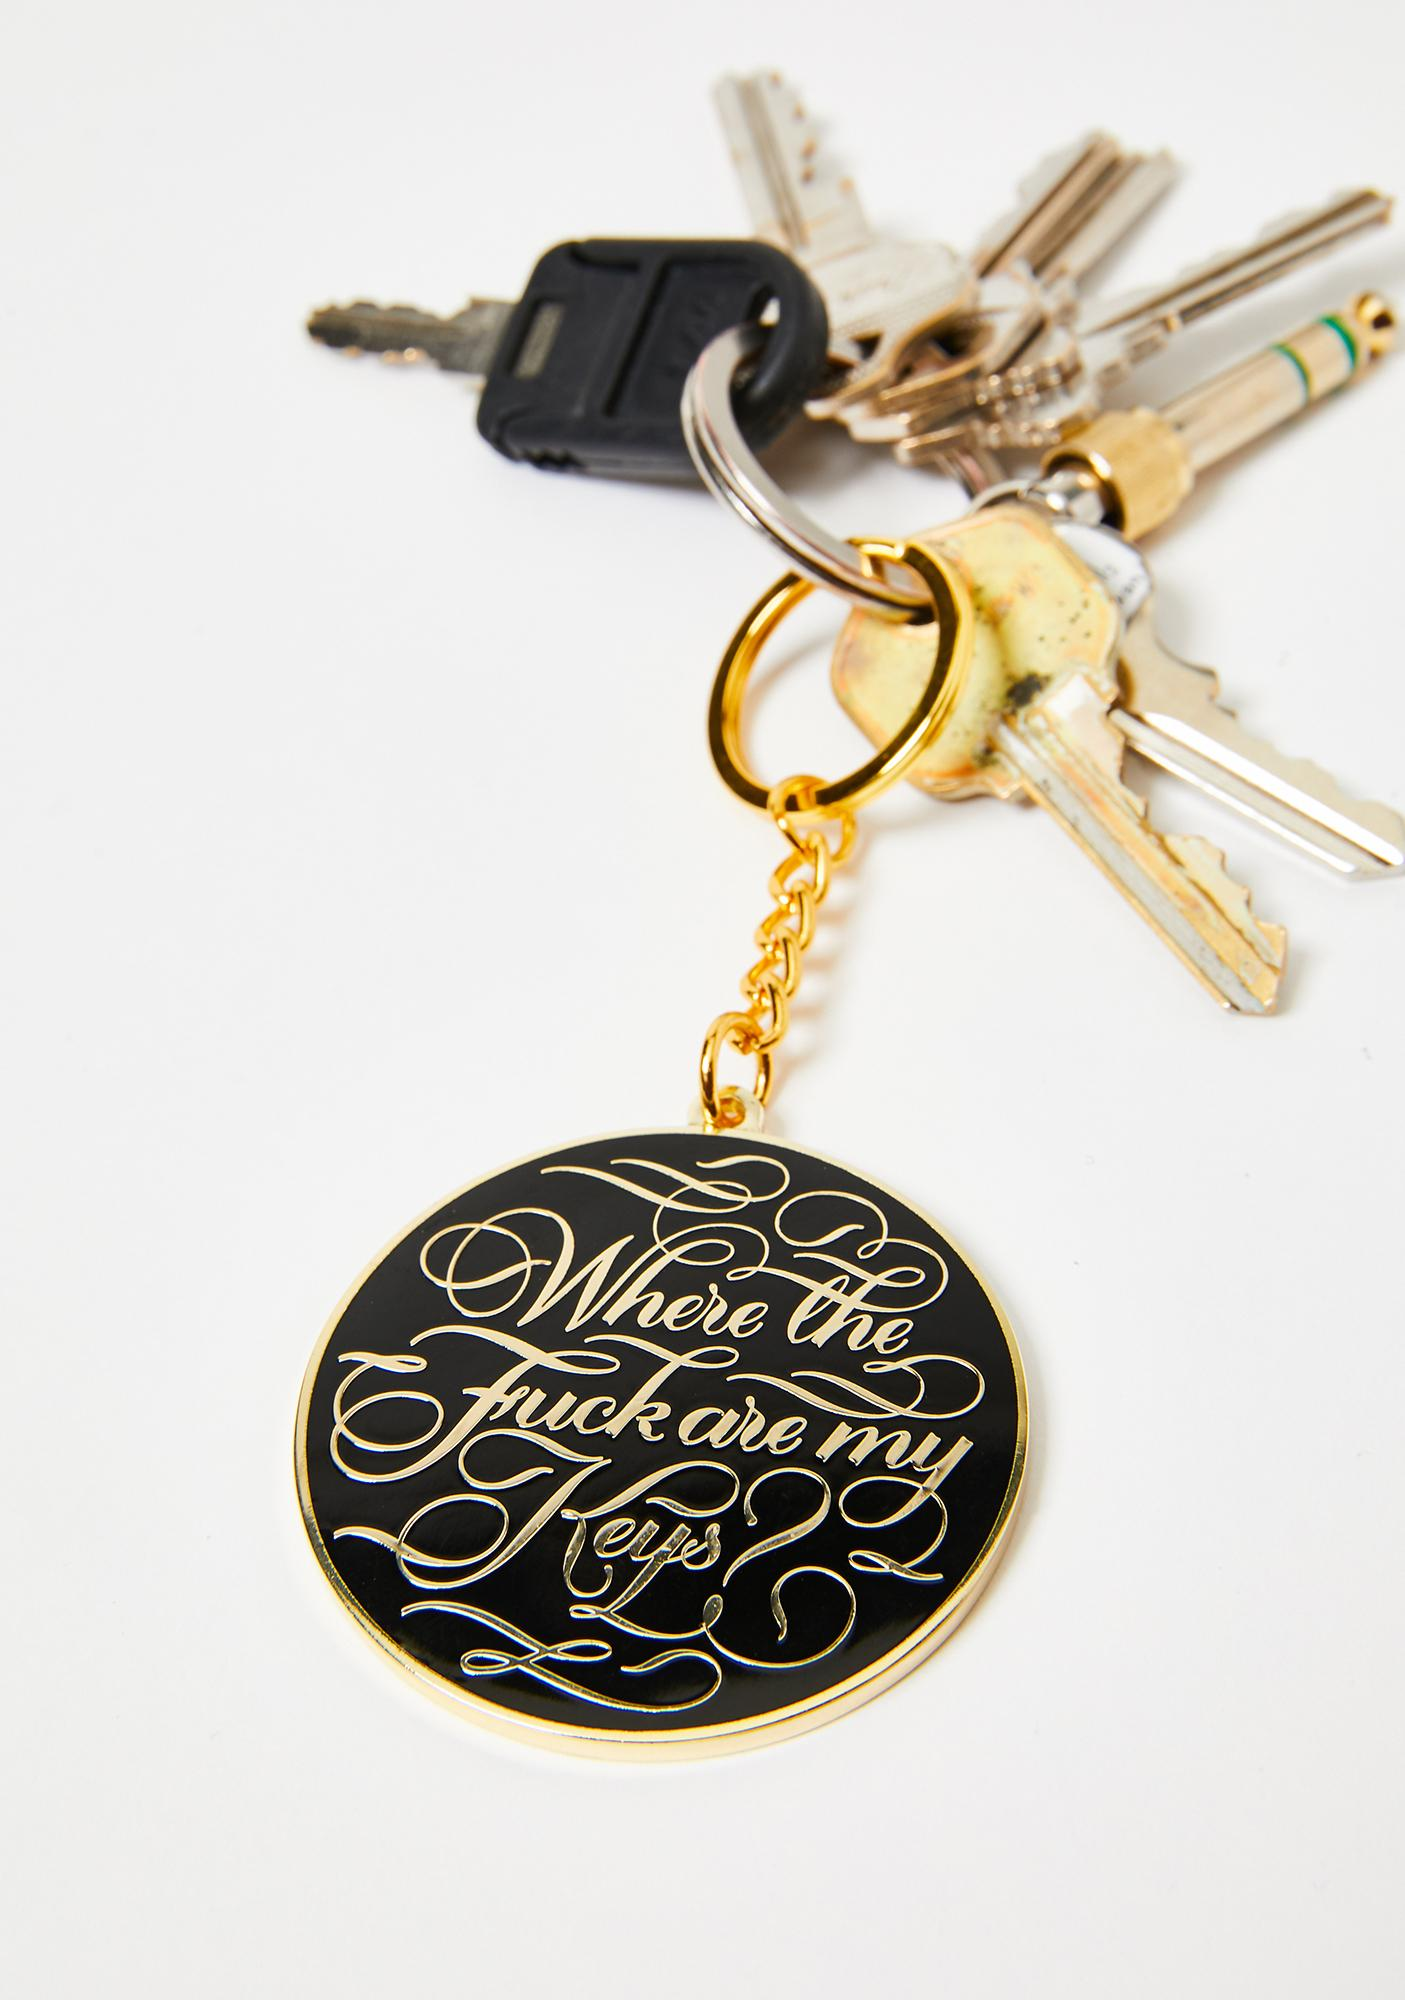 Organized Mess Pendant Keychain